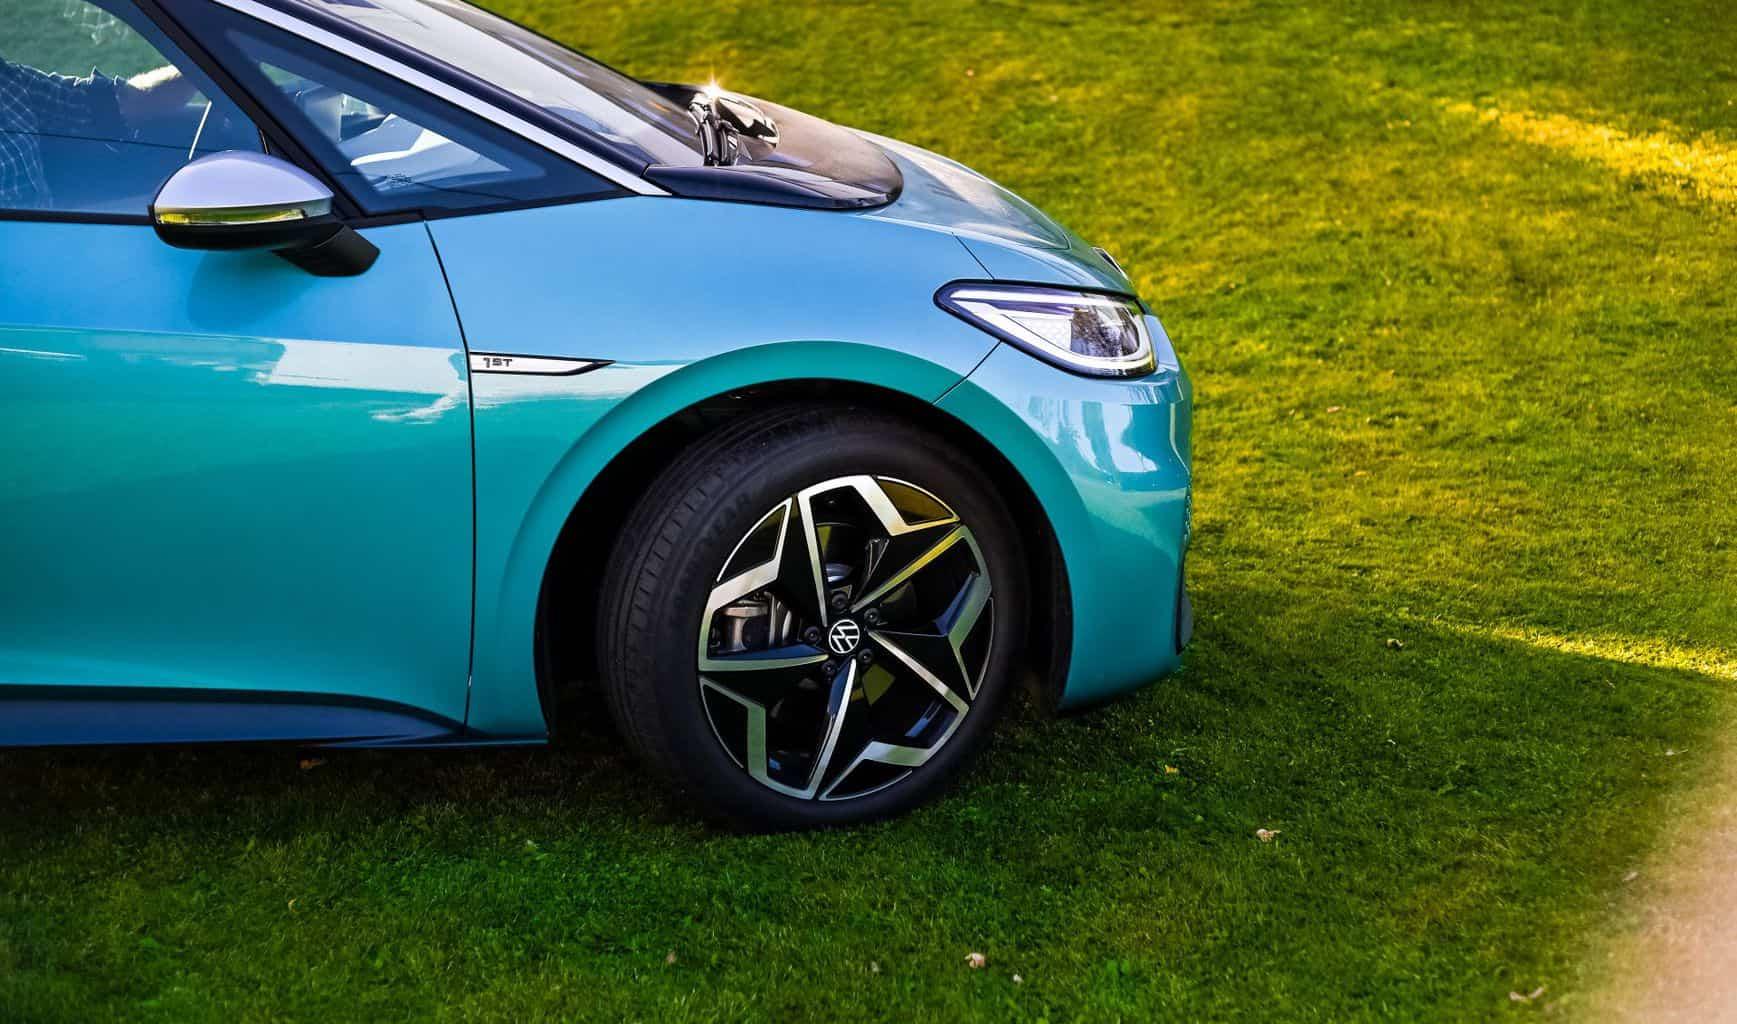 Hoffnungsträger VW ID.3 blickt auf 38.000 Bestellungen & 14.000 Auslieferungen